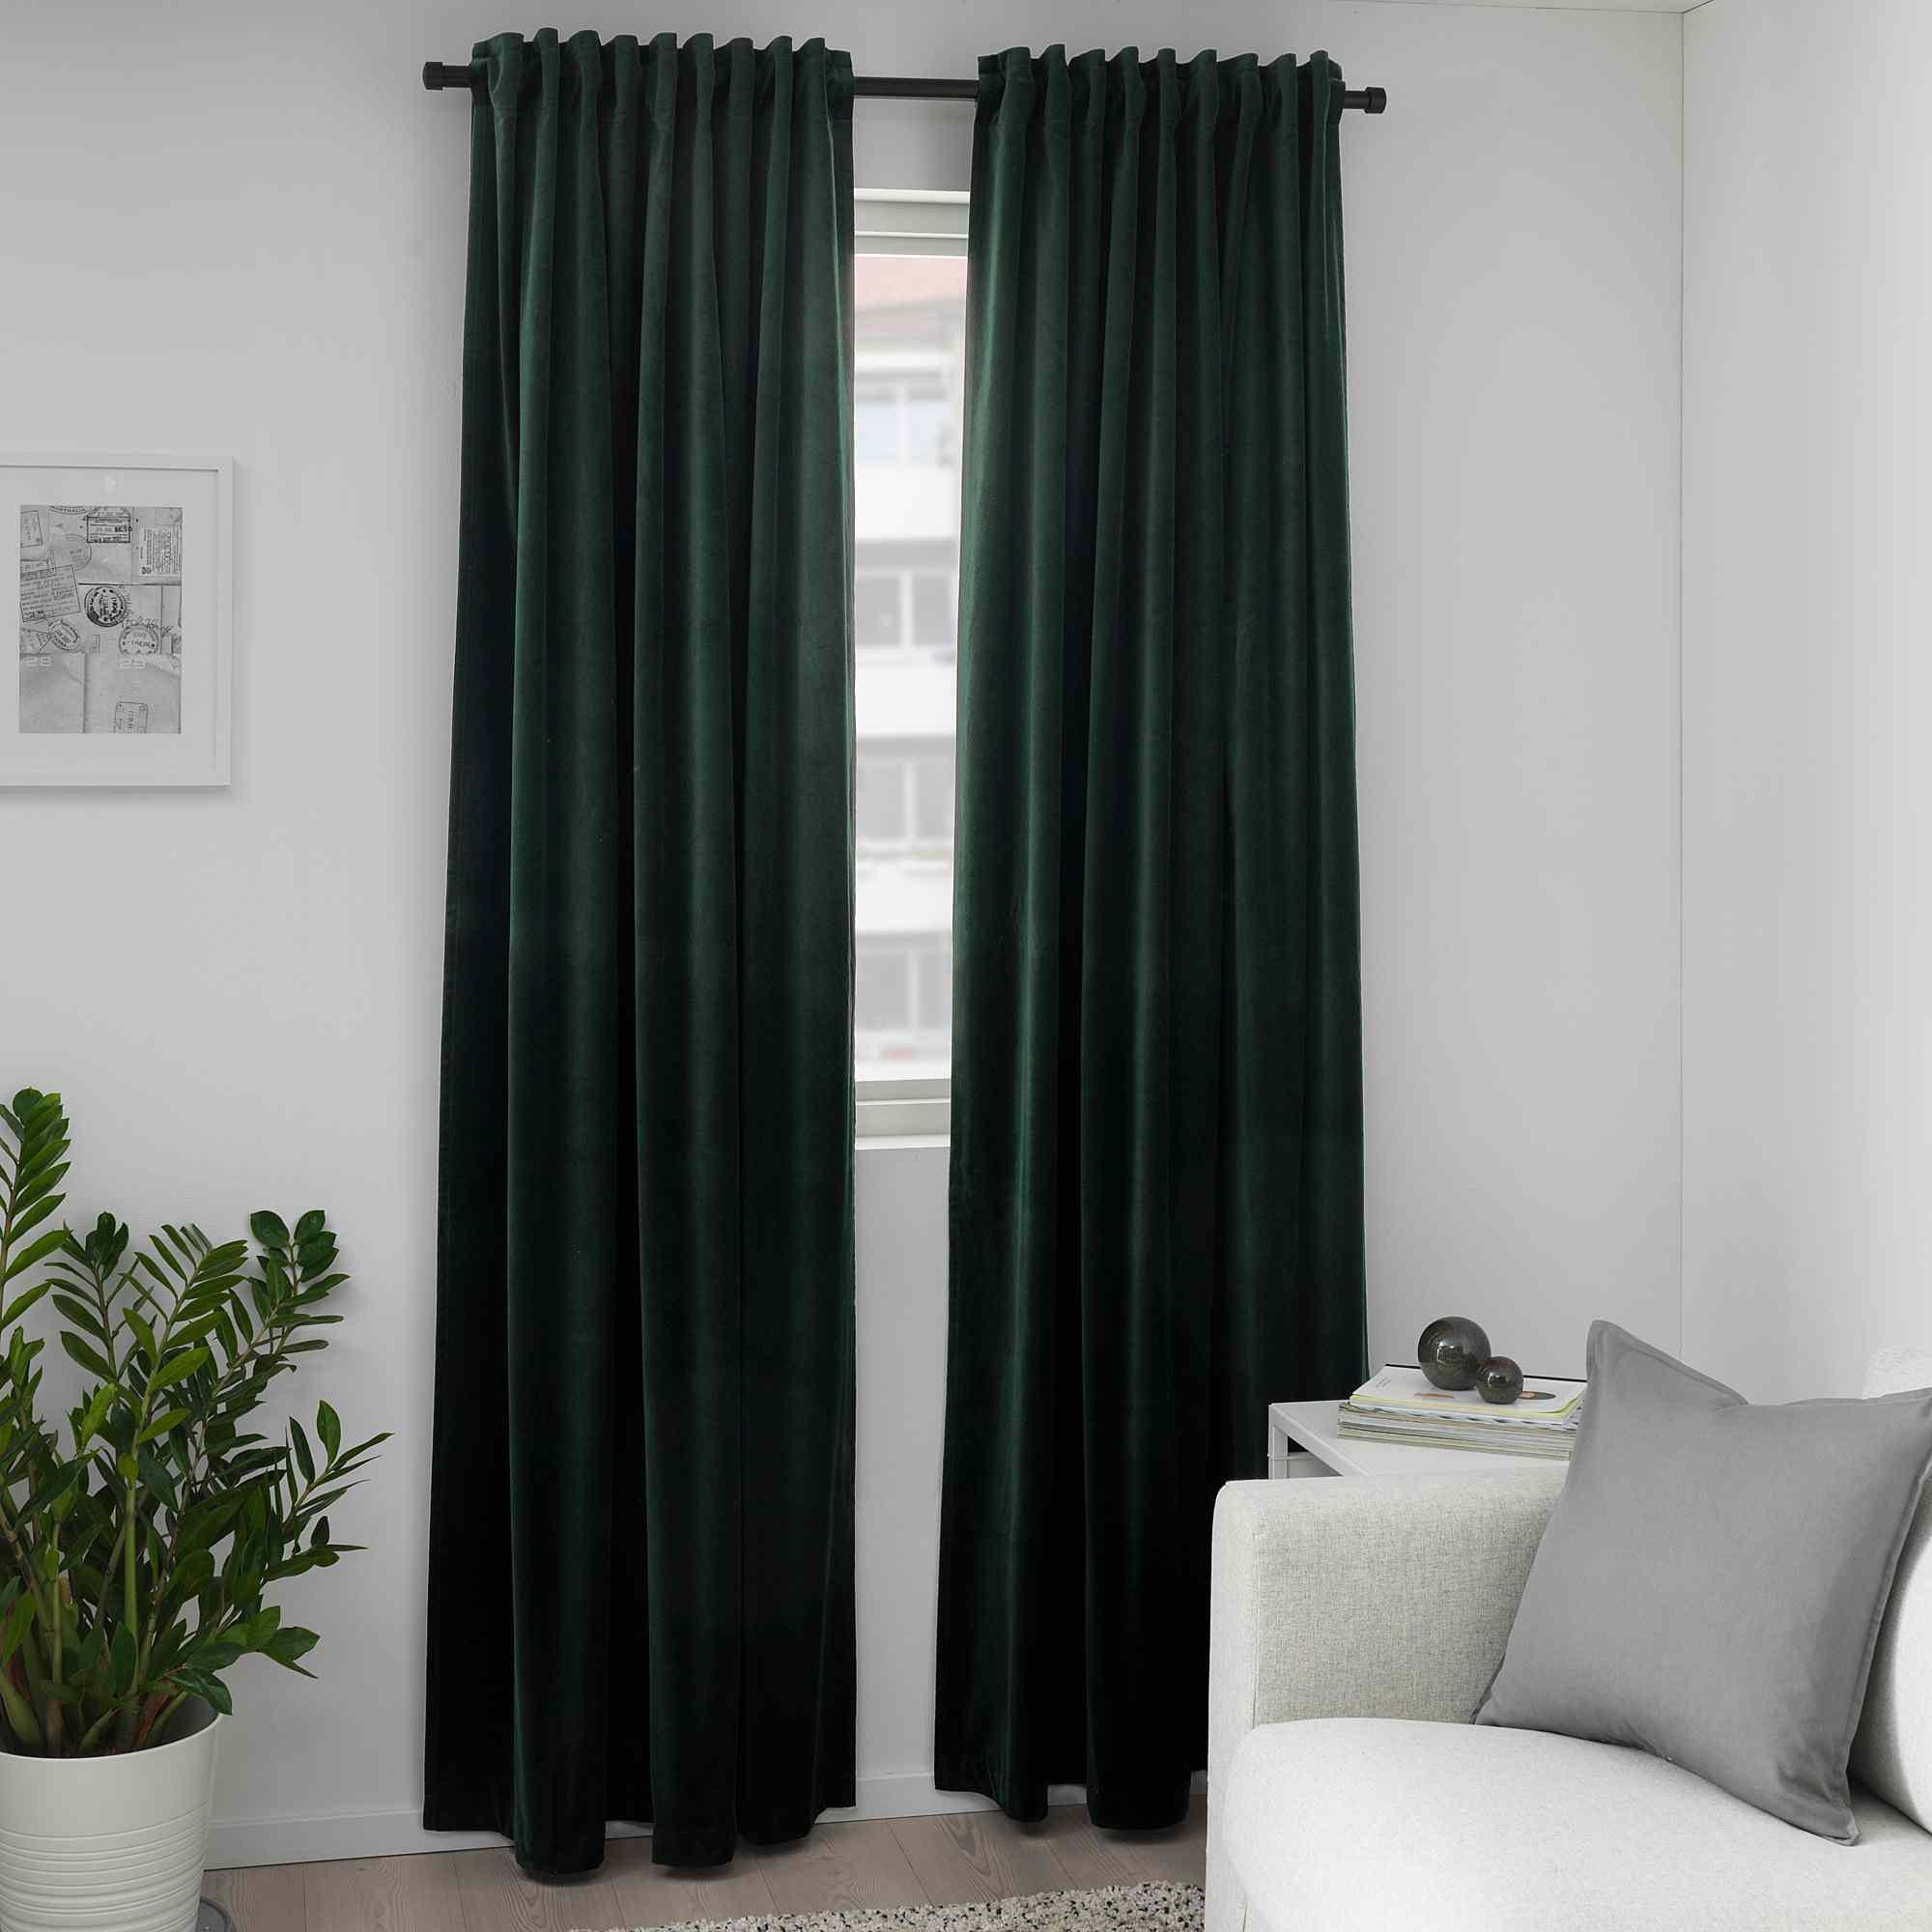 Green drapes